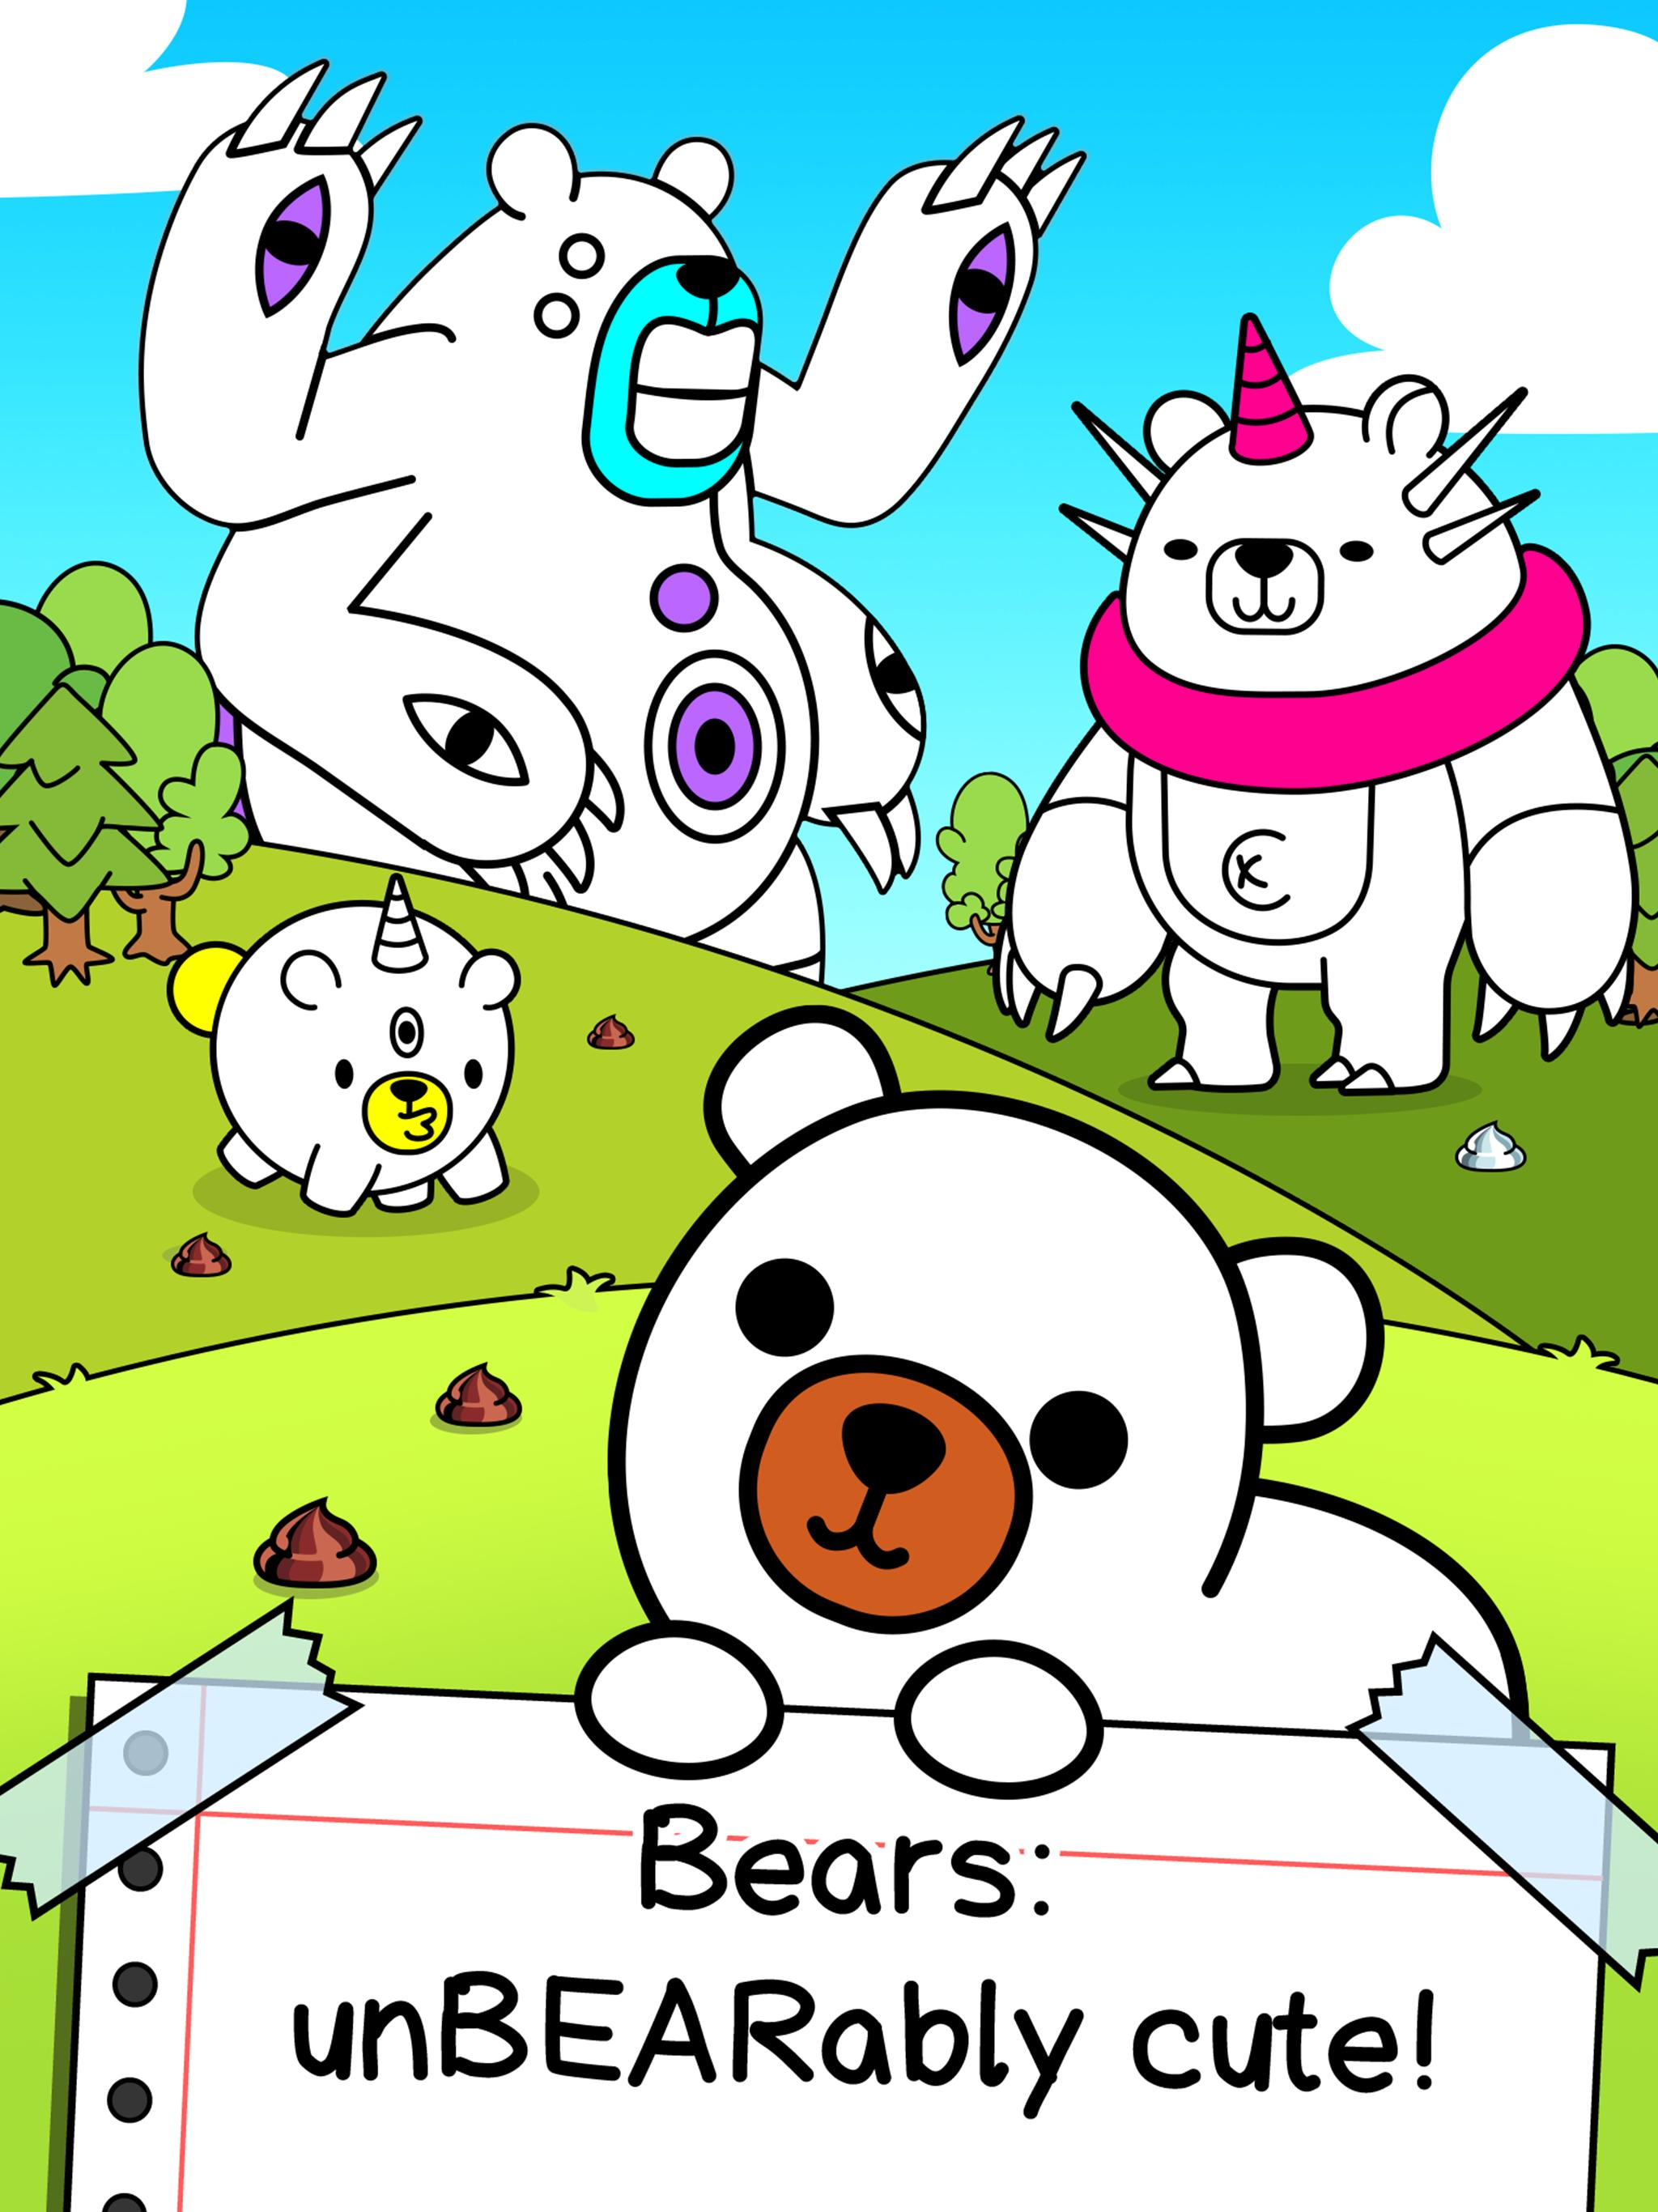 Bear Evolution UnBEARably Fun Clicker Game 1.0 Screenshot 9